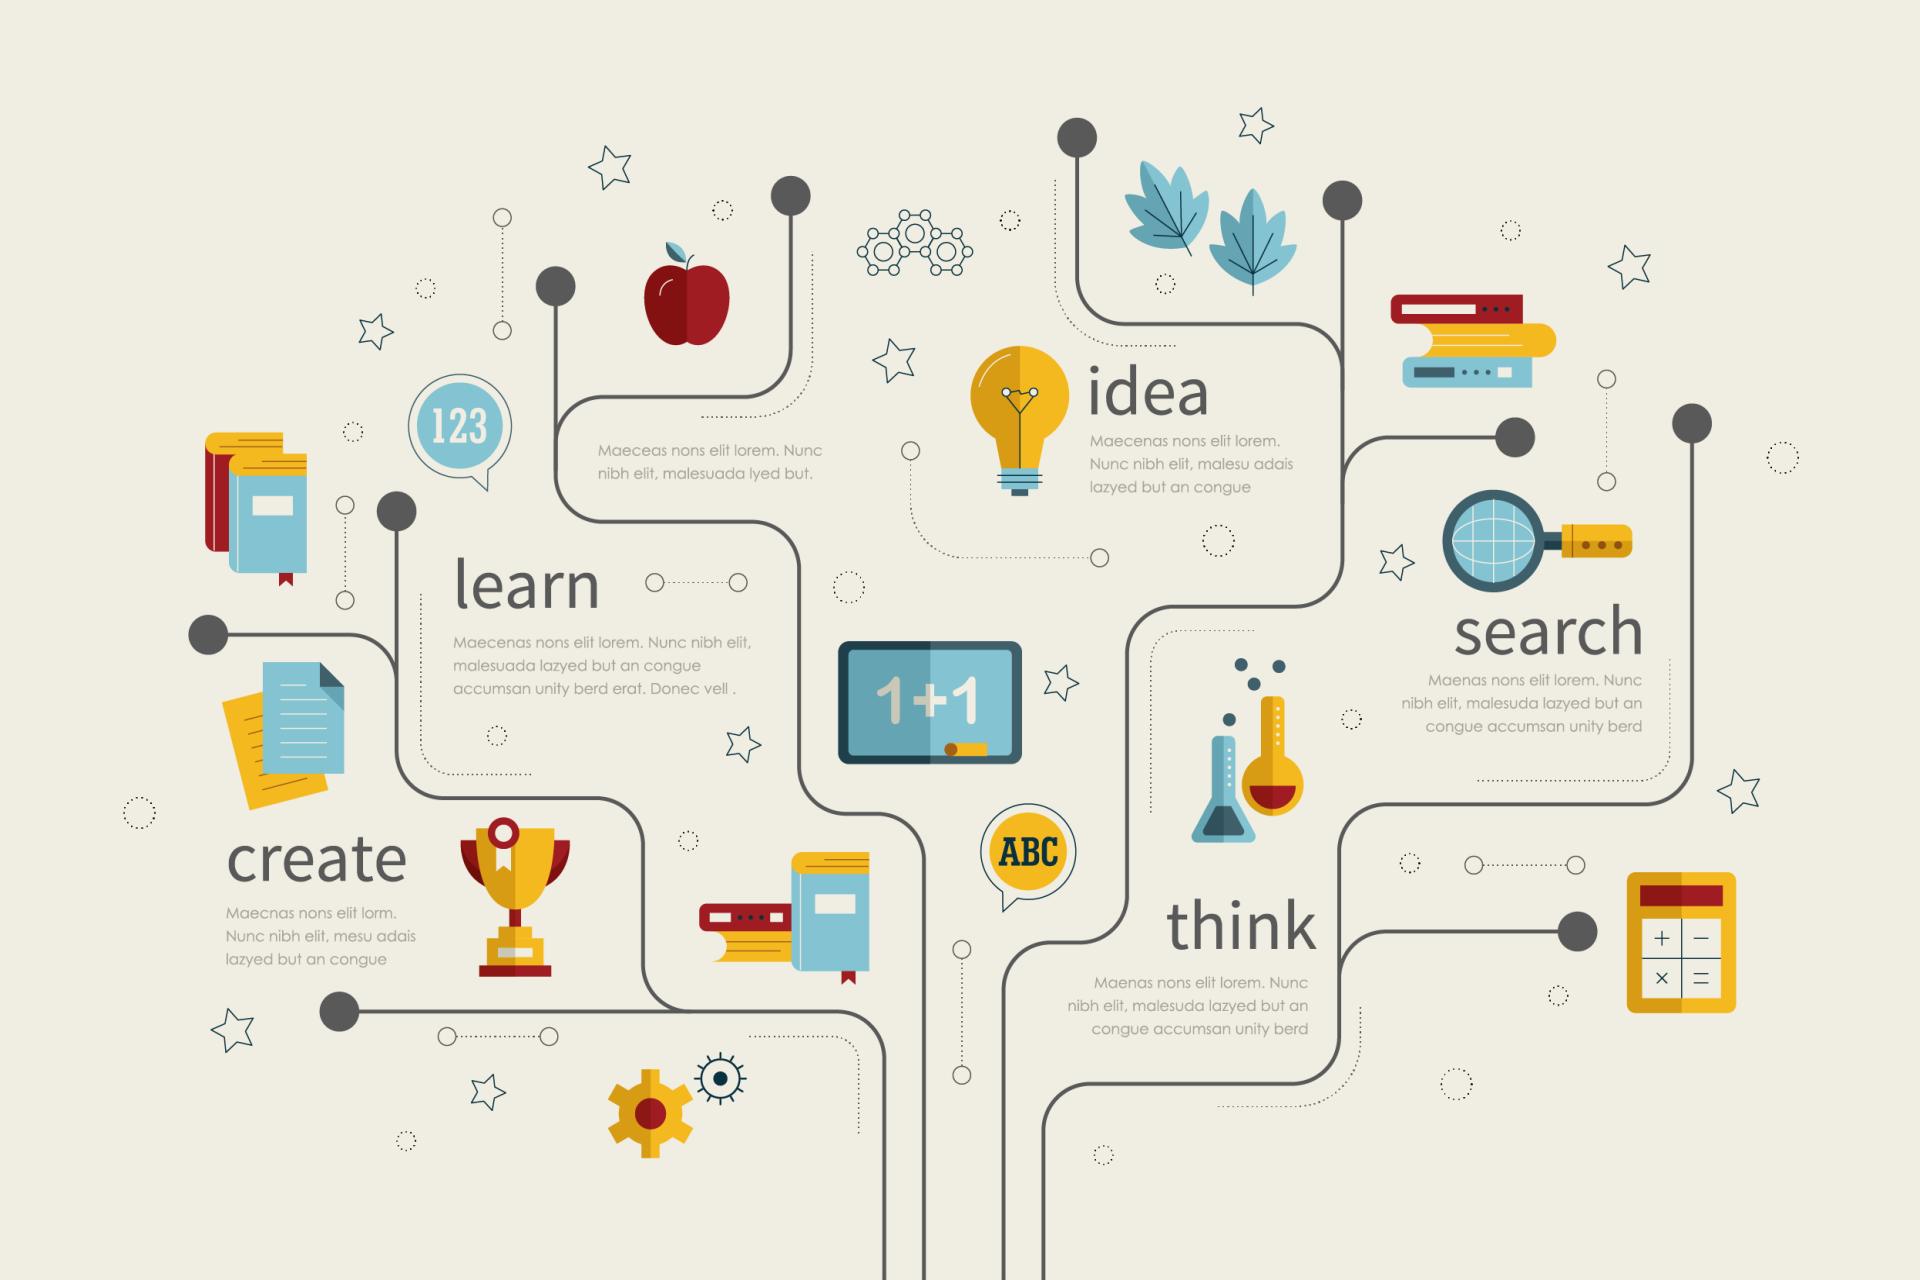 Concept map: Idea, Learn, Create, Think, Search